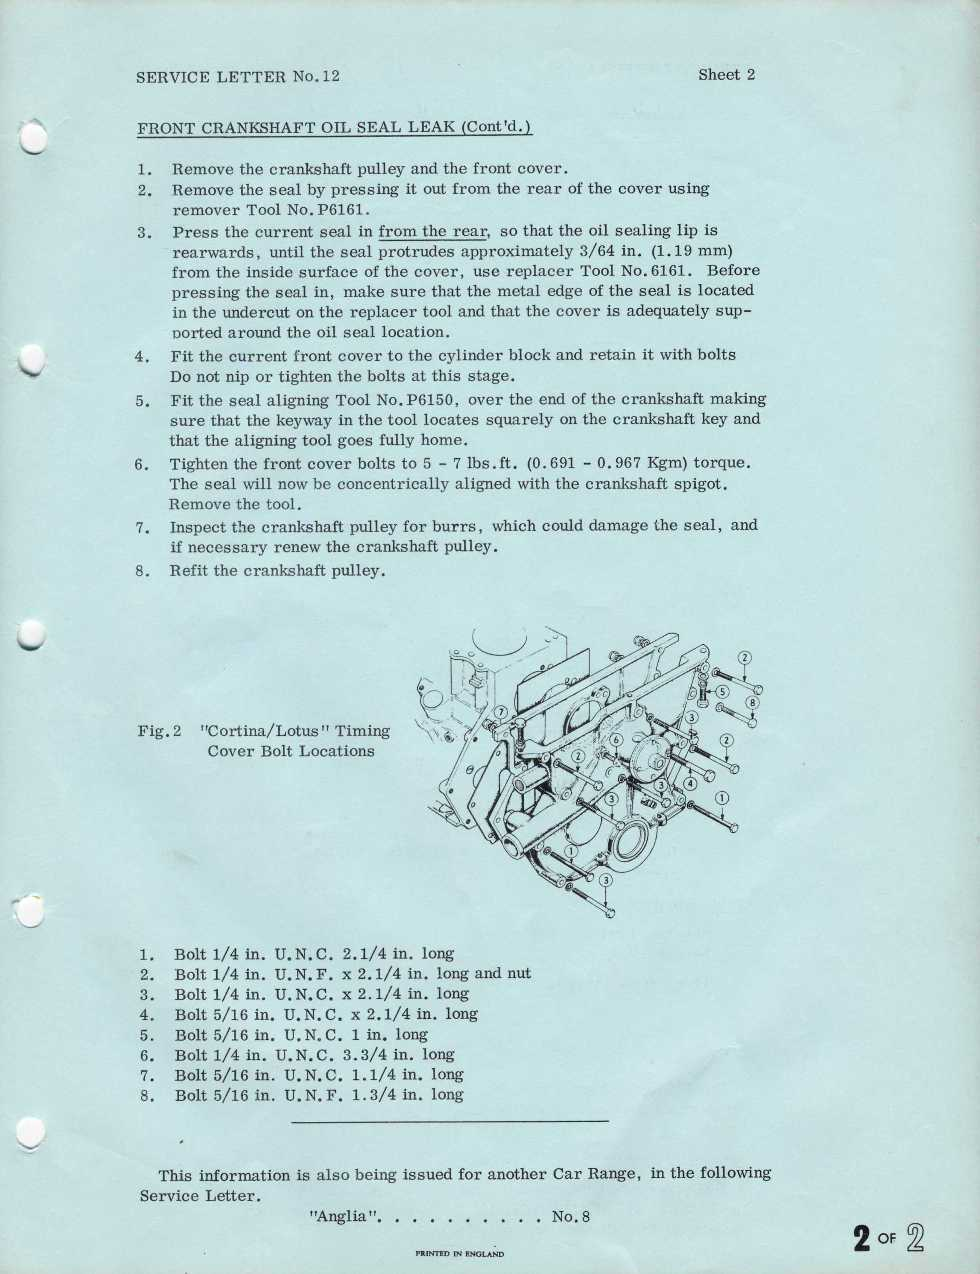 80-change-service-front-crankshaft-oil-seal-3